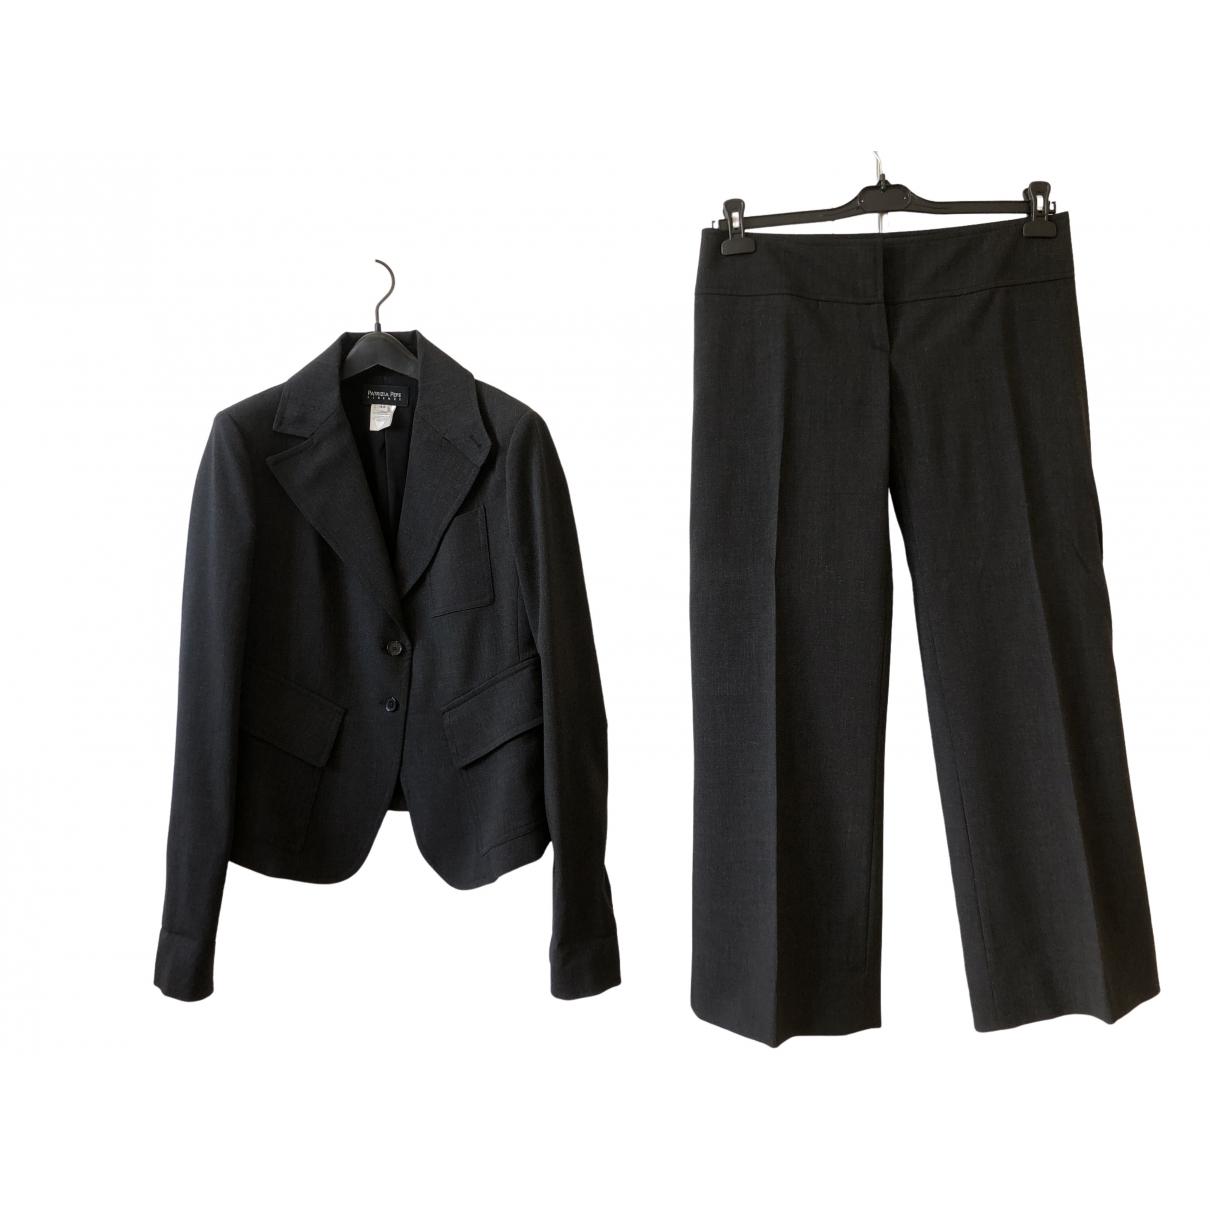 Patrizia Pepe \N Anthracite Wool jacket for Women 44 IT